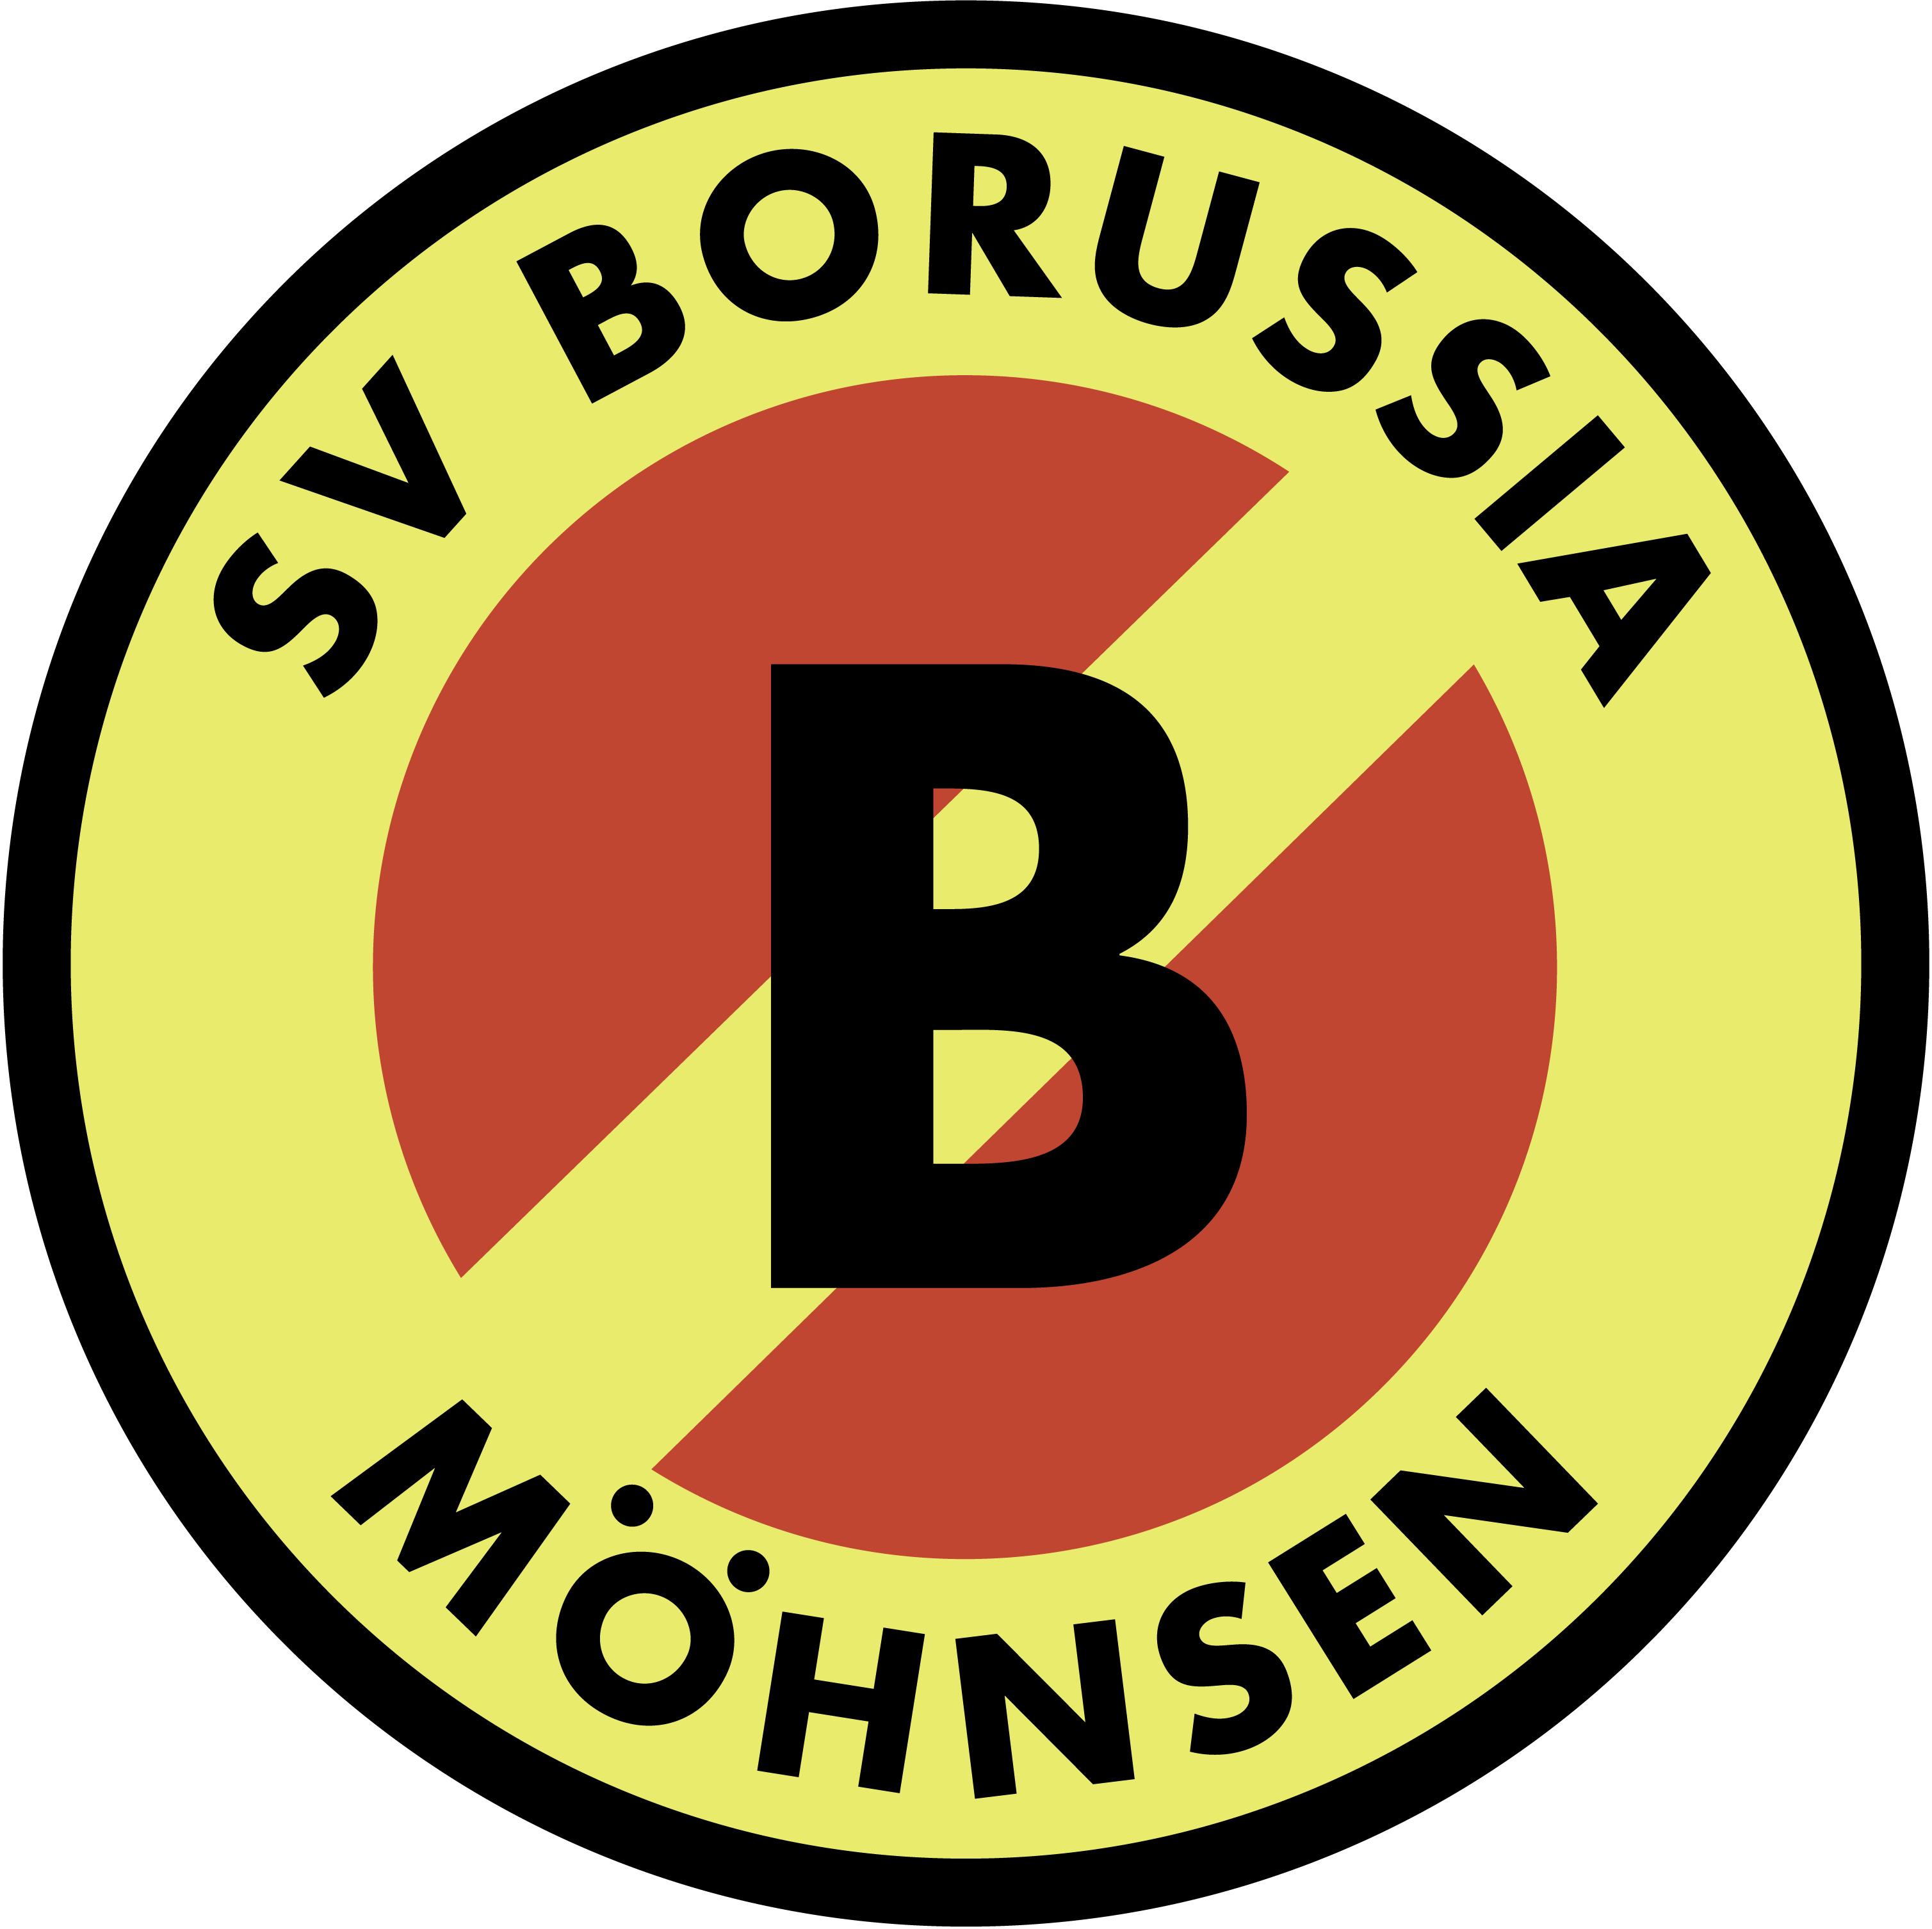 SV Borussia Möhnsen 1957 e.V.